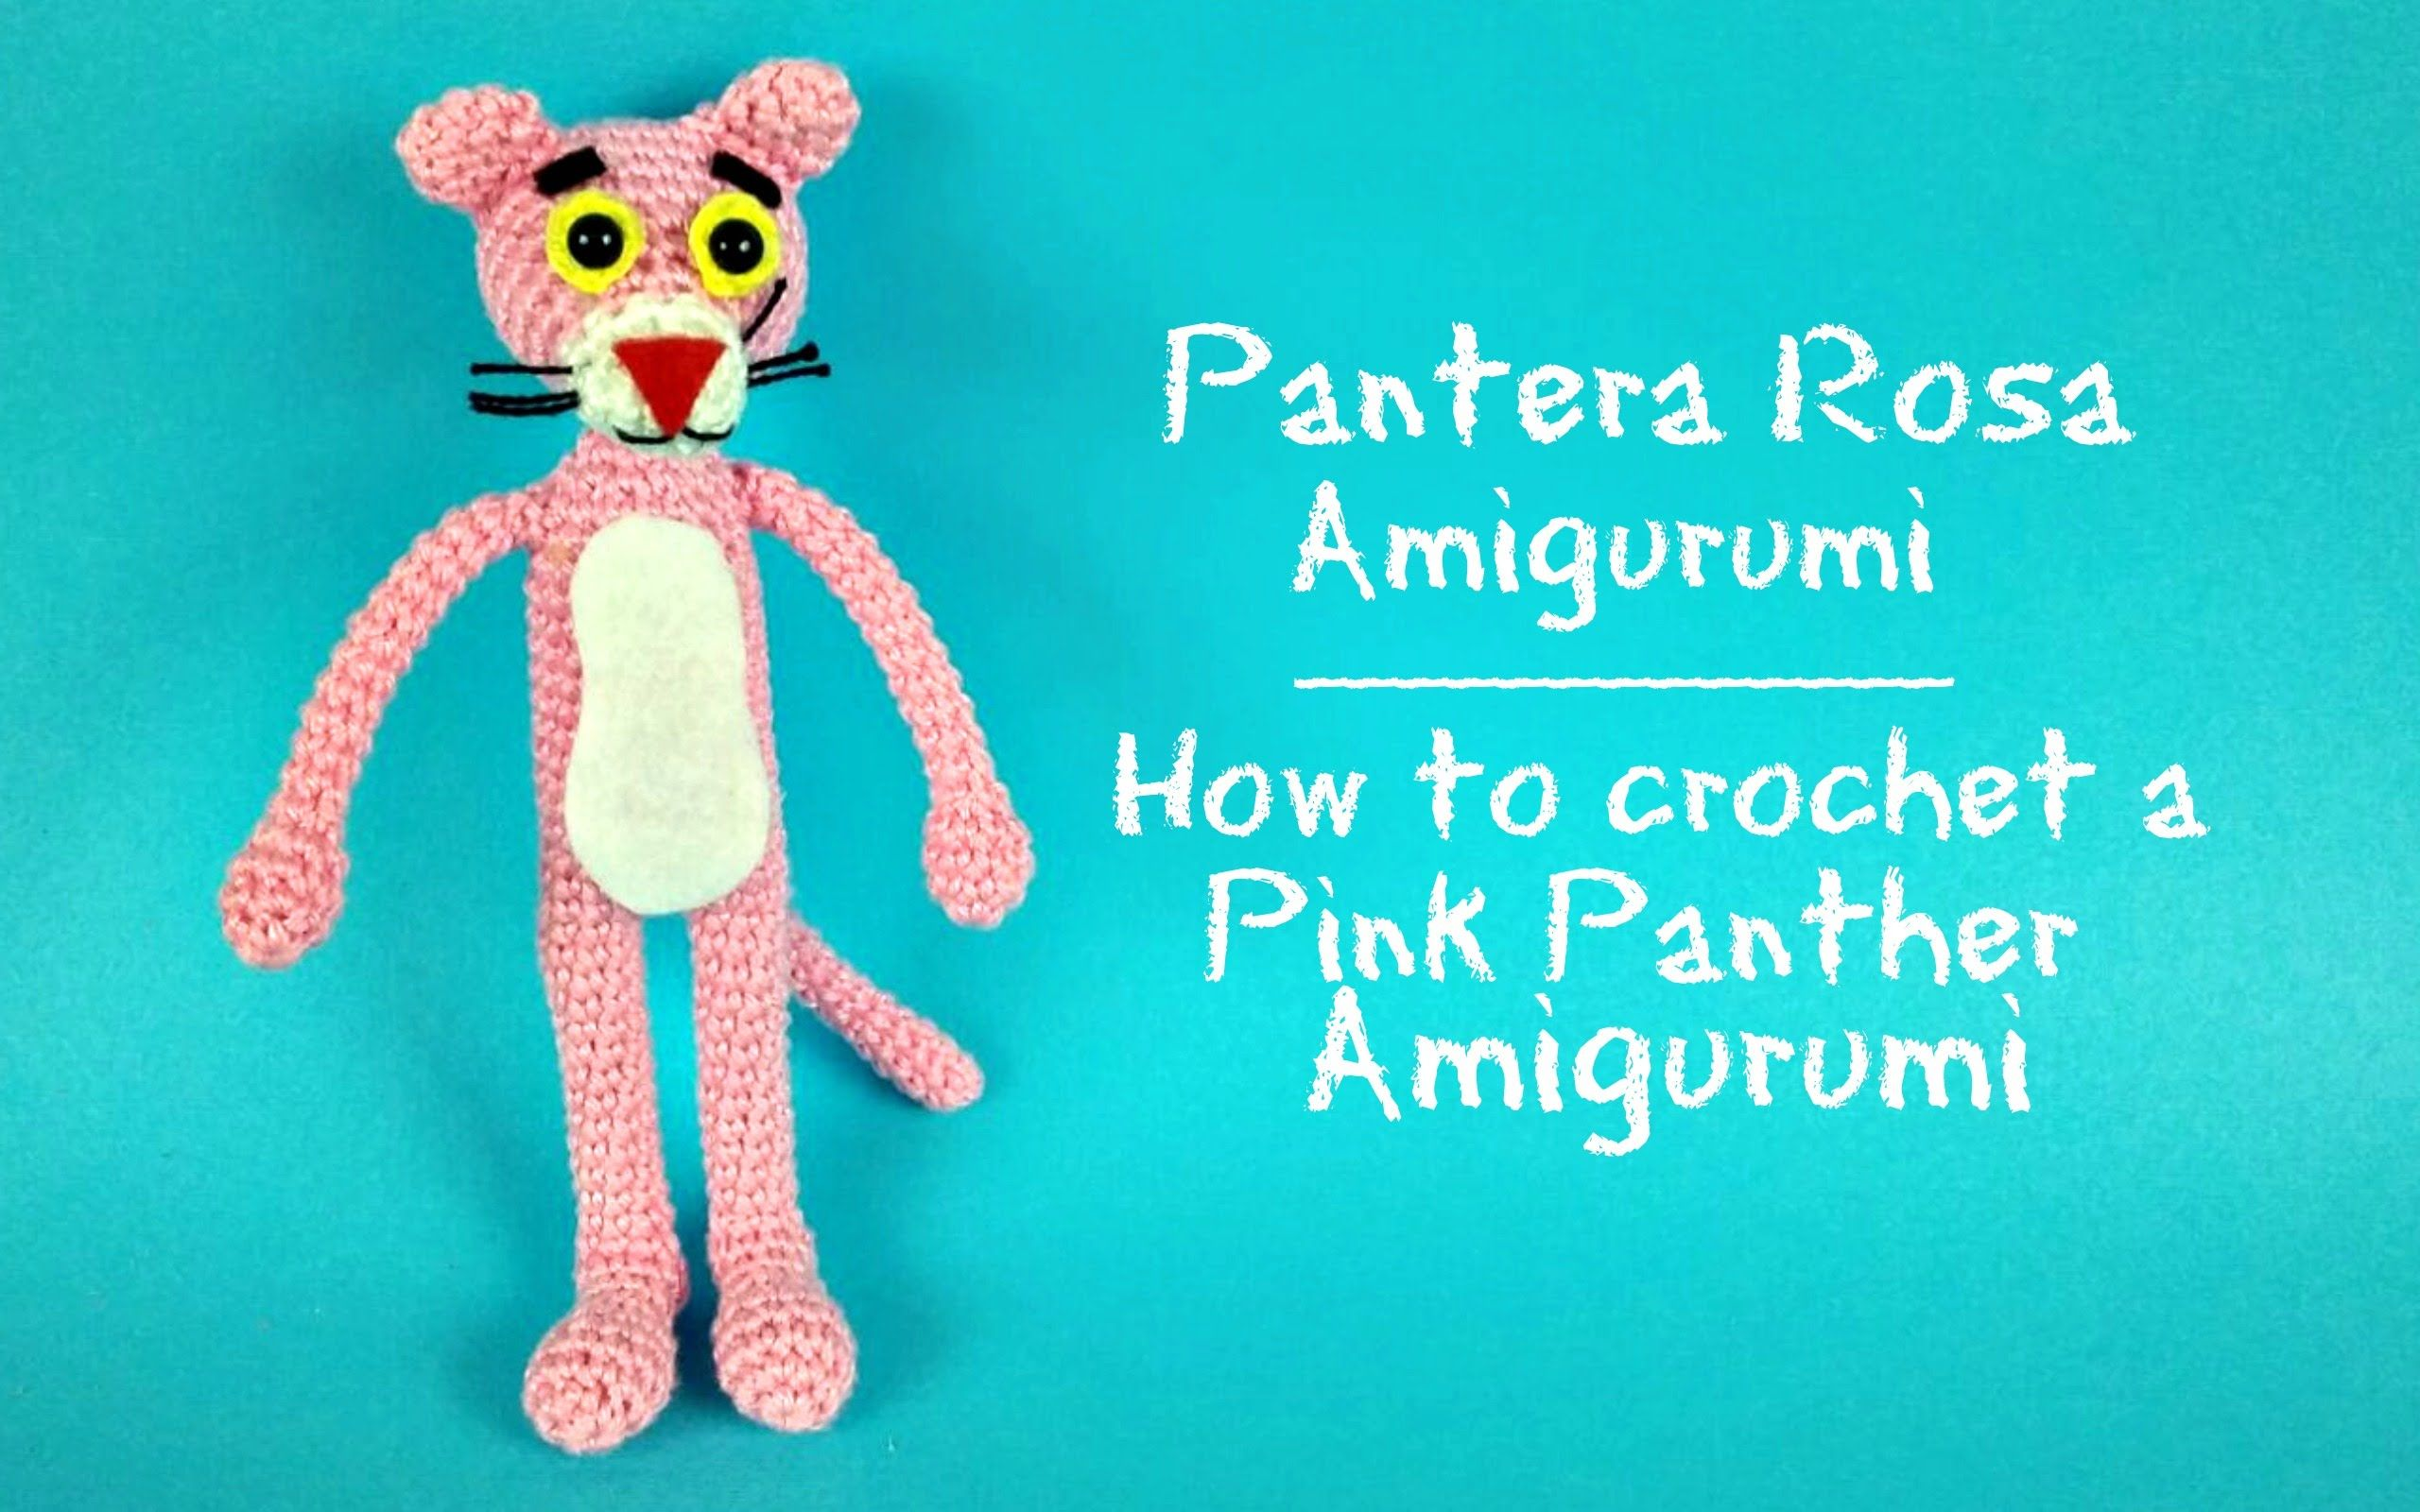 Pantera Rosa Amigurumi   How to crochet a Pink Panther Amigurumi ...